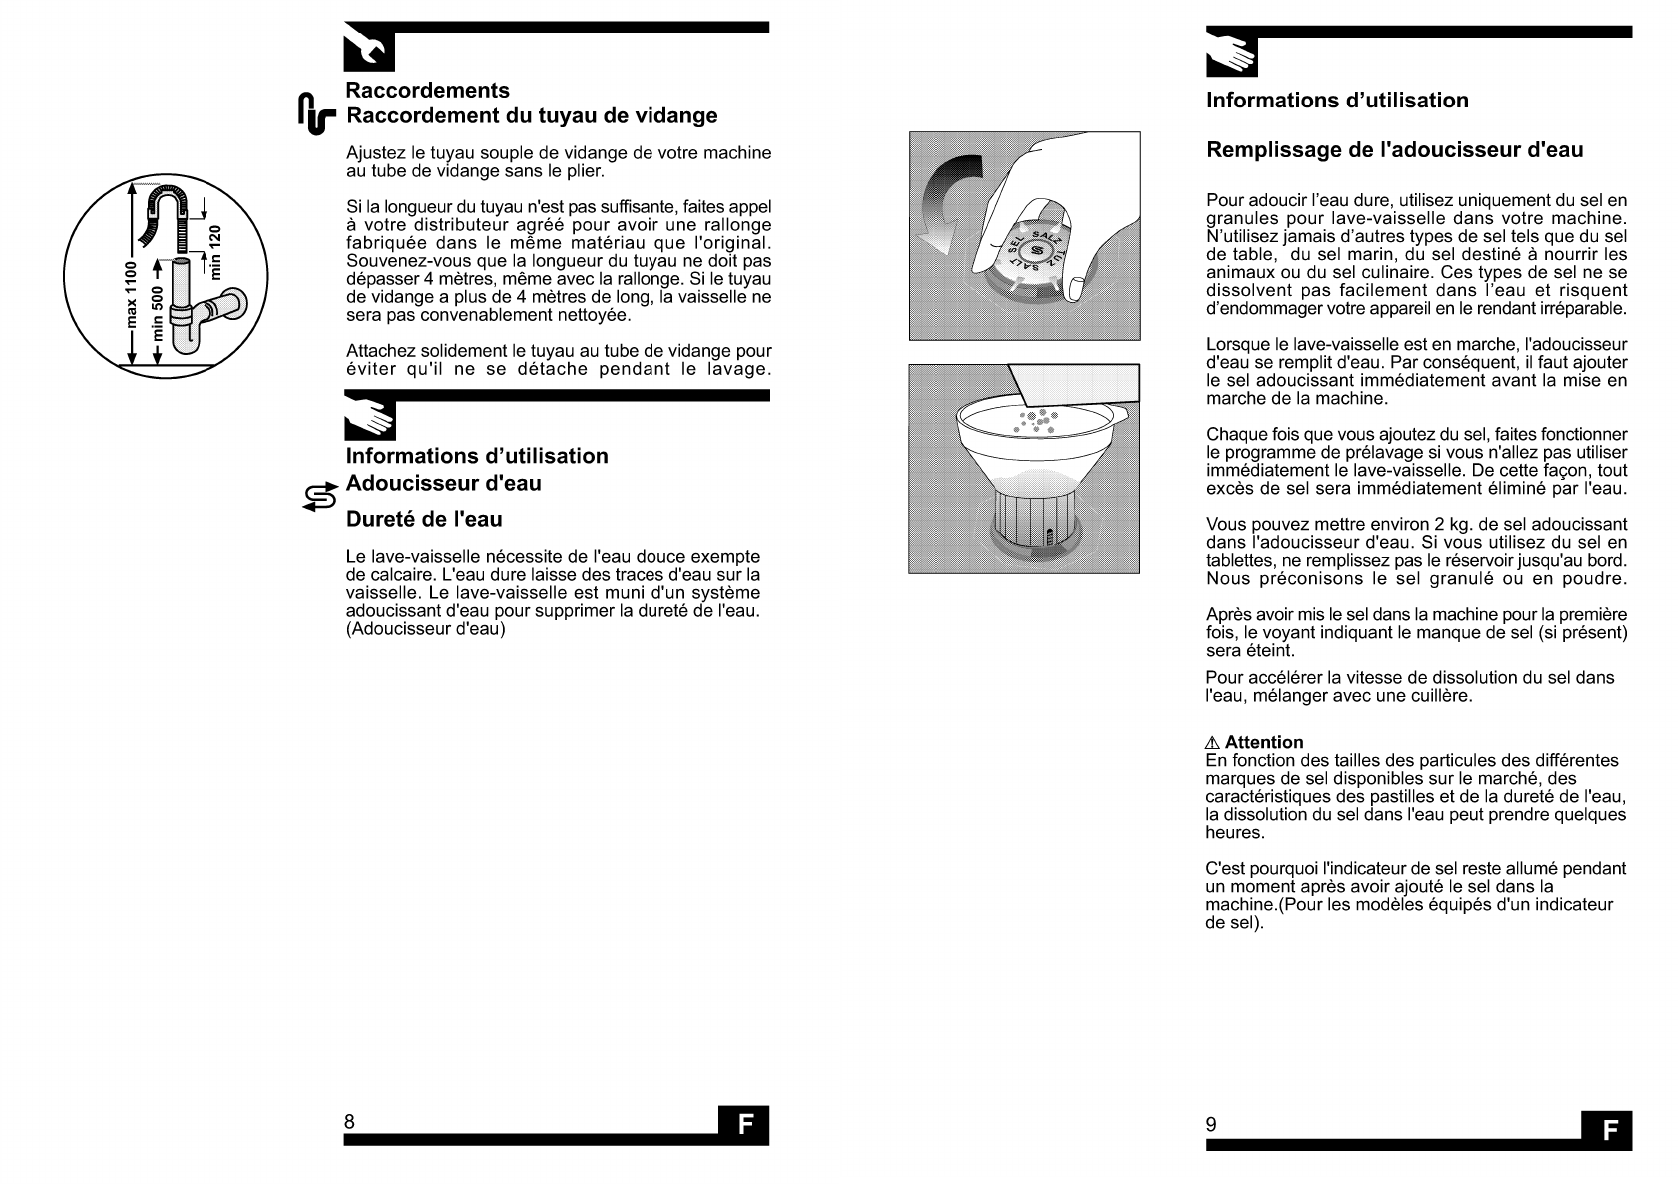 Handleiding Beko D 8879 Fd Pagina 12 Van 12 Francais